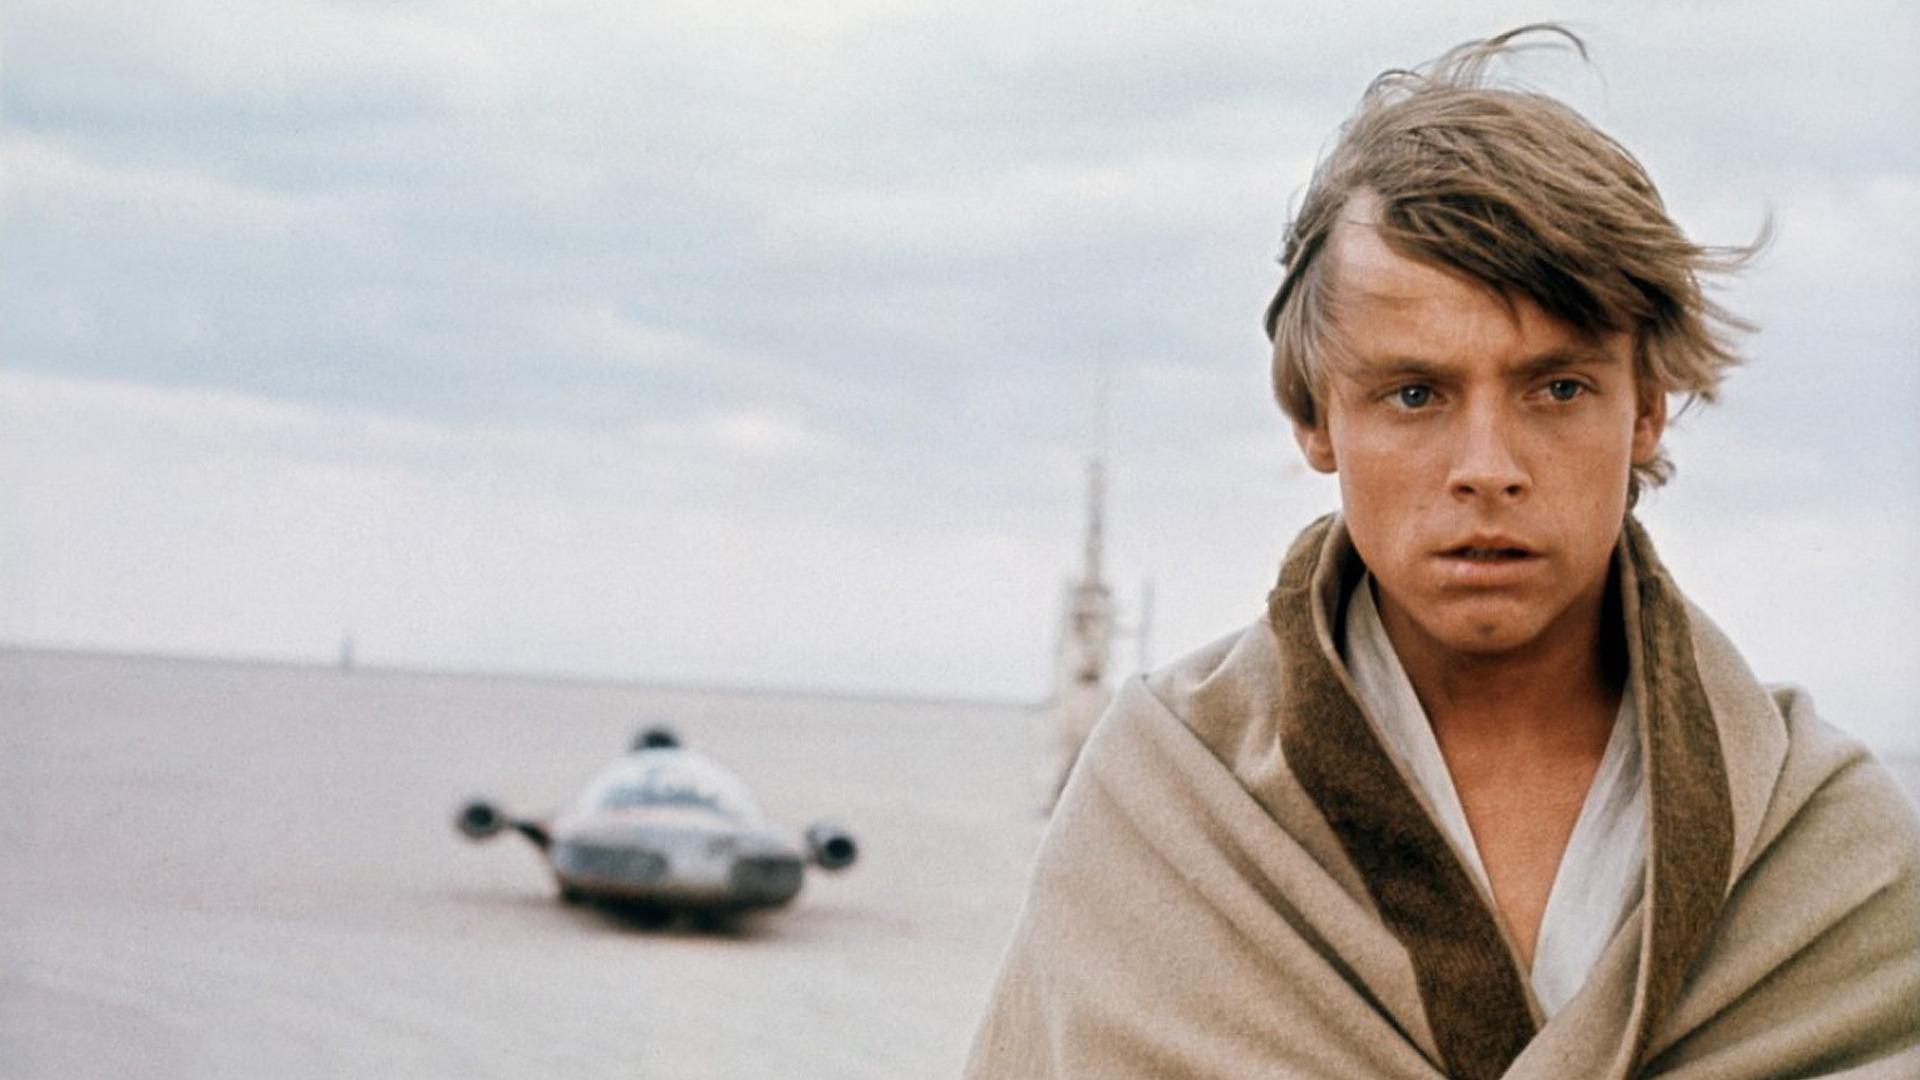 Star Wars Luke Skywalker Mark Hamill wallpaper 1920x1080 1920x1080